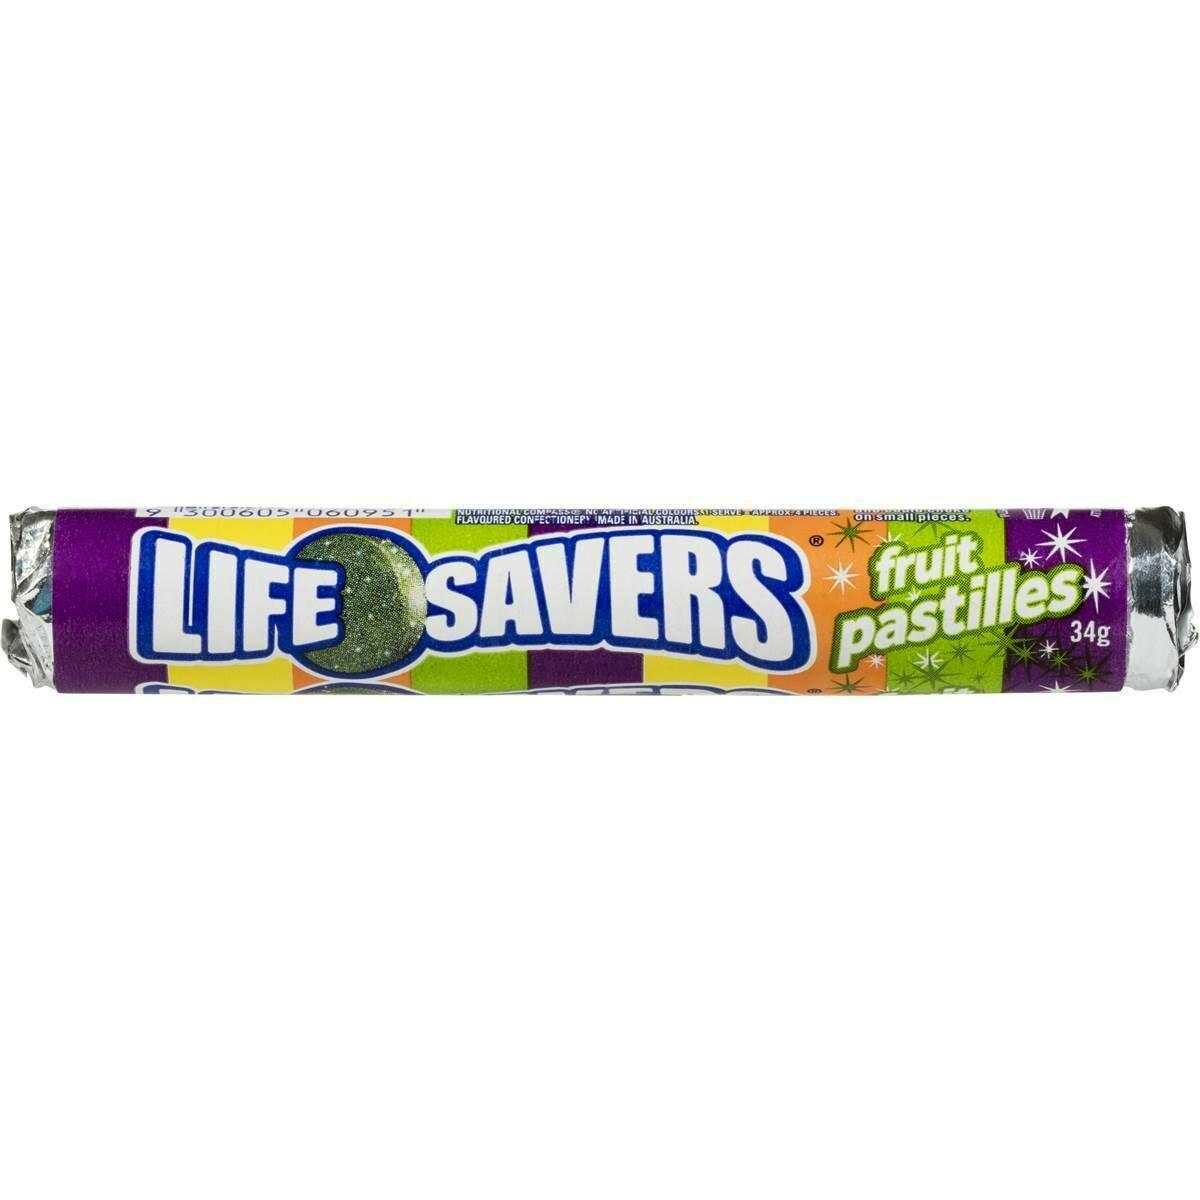 Lifesavers Fruit Pastels 34G